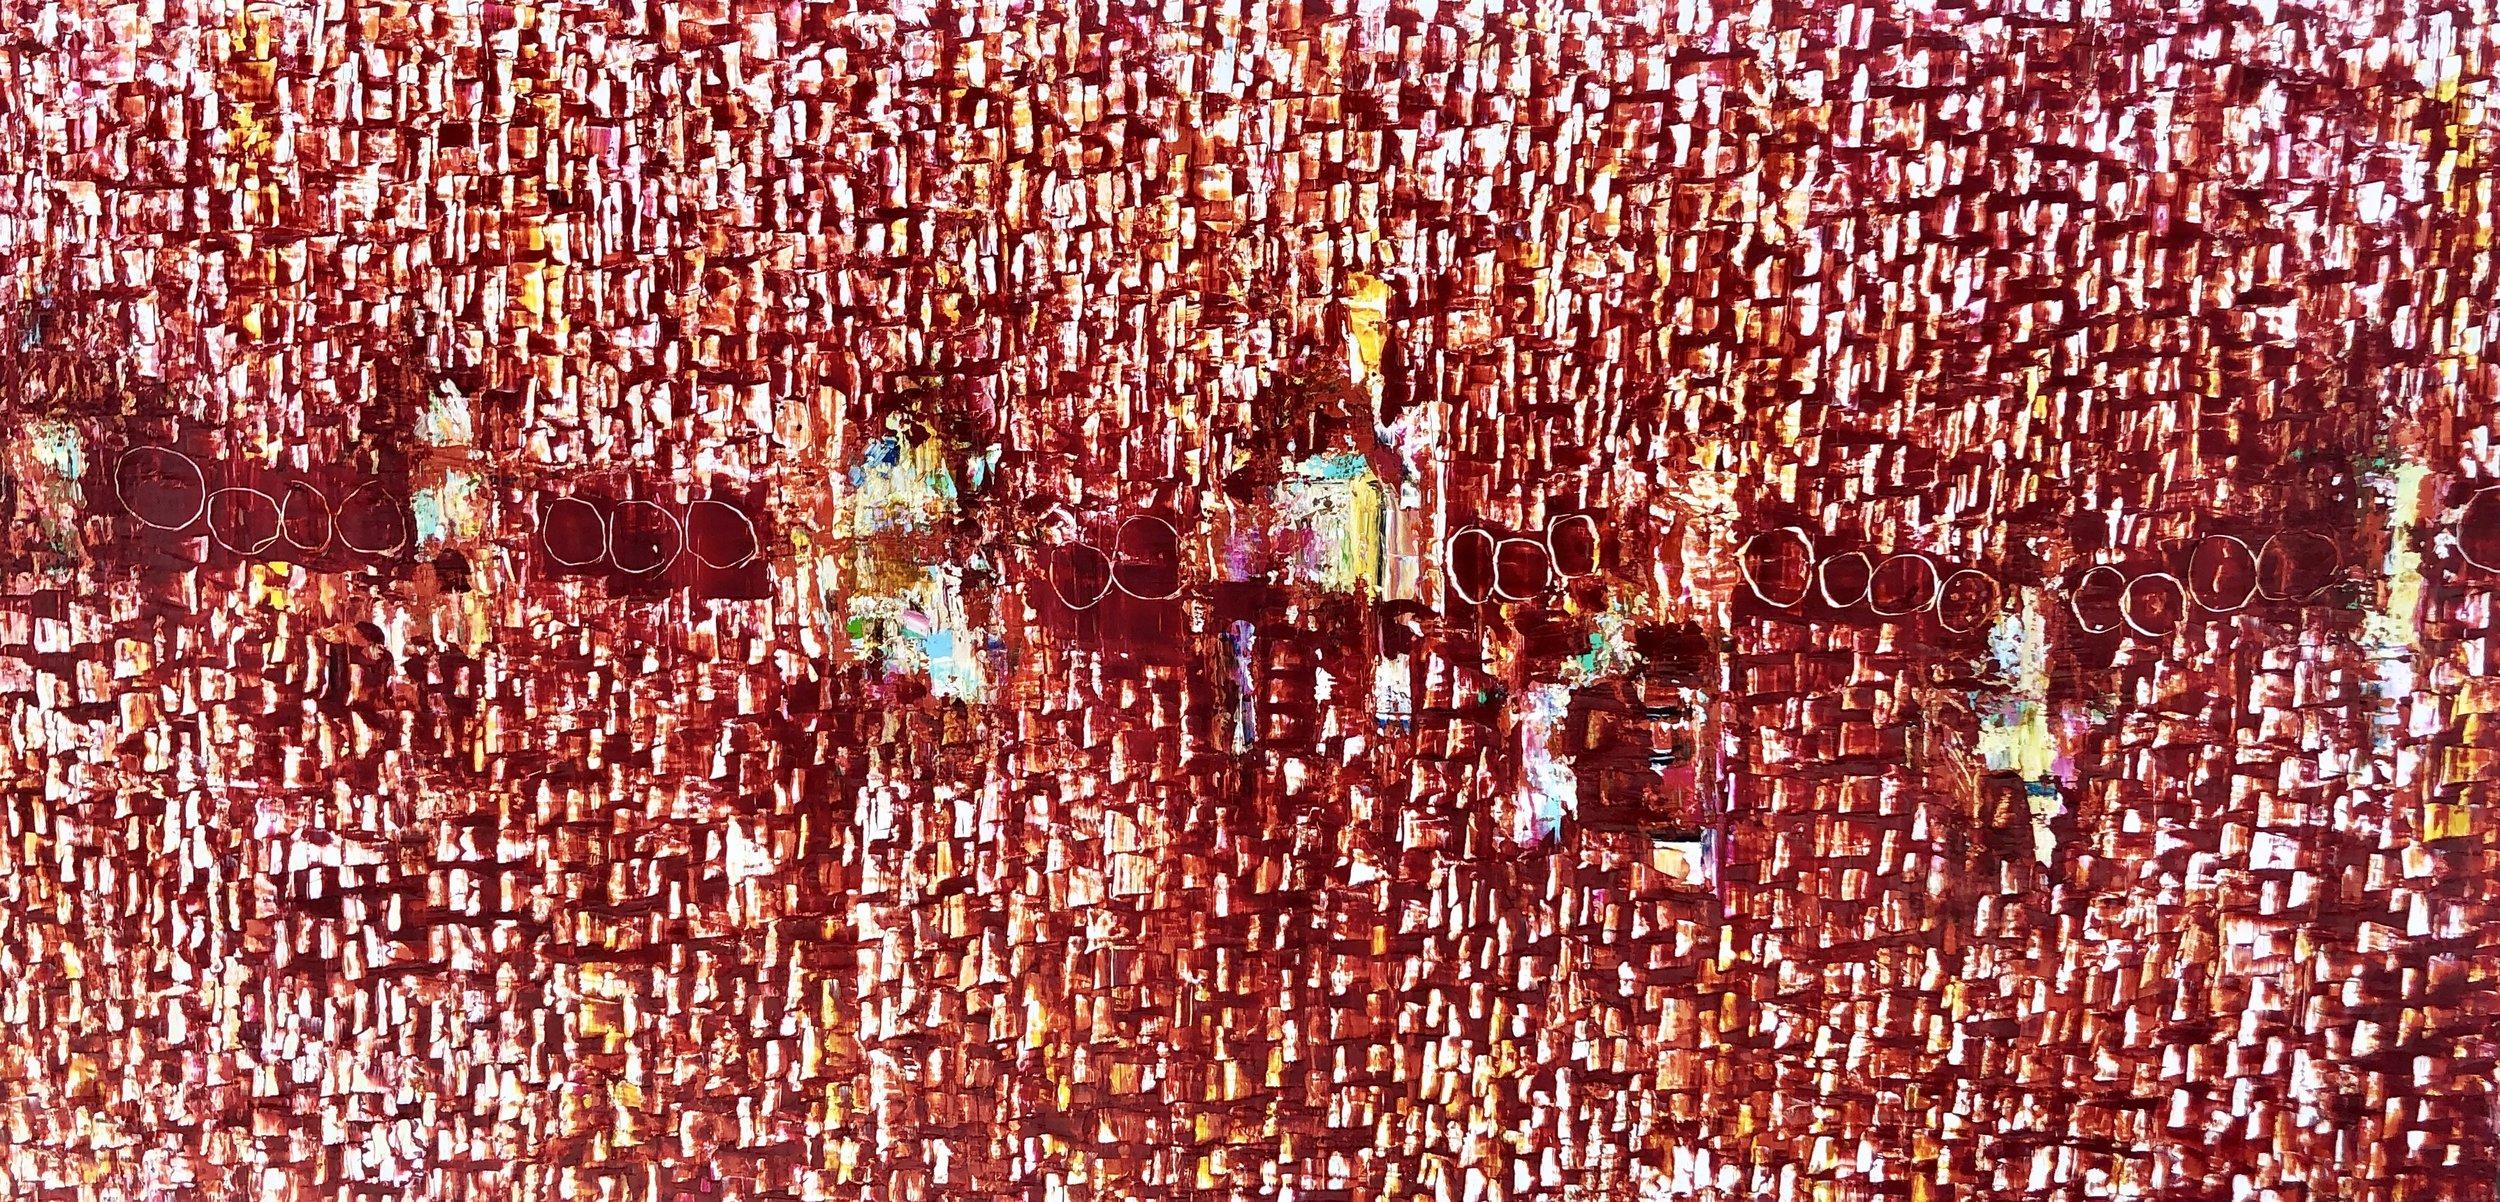 "'It's raining Crimson"" 36"" x 72"" x 2.5"", oil on canvas"